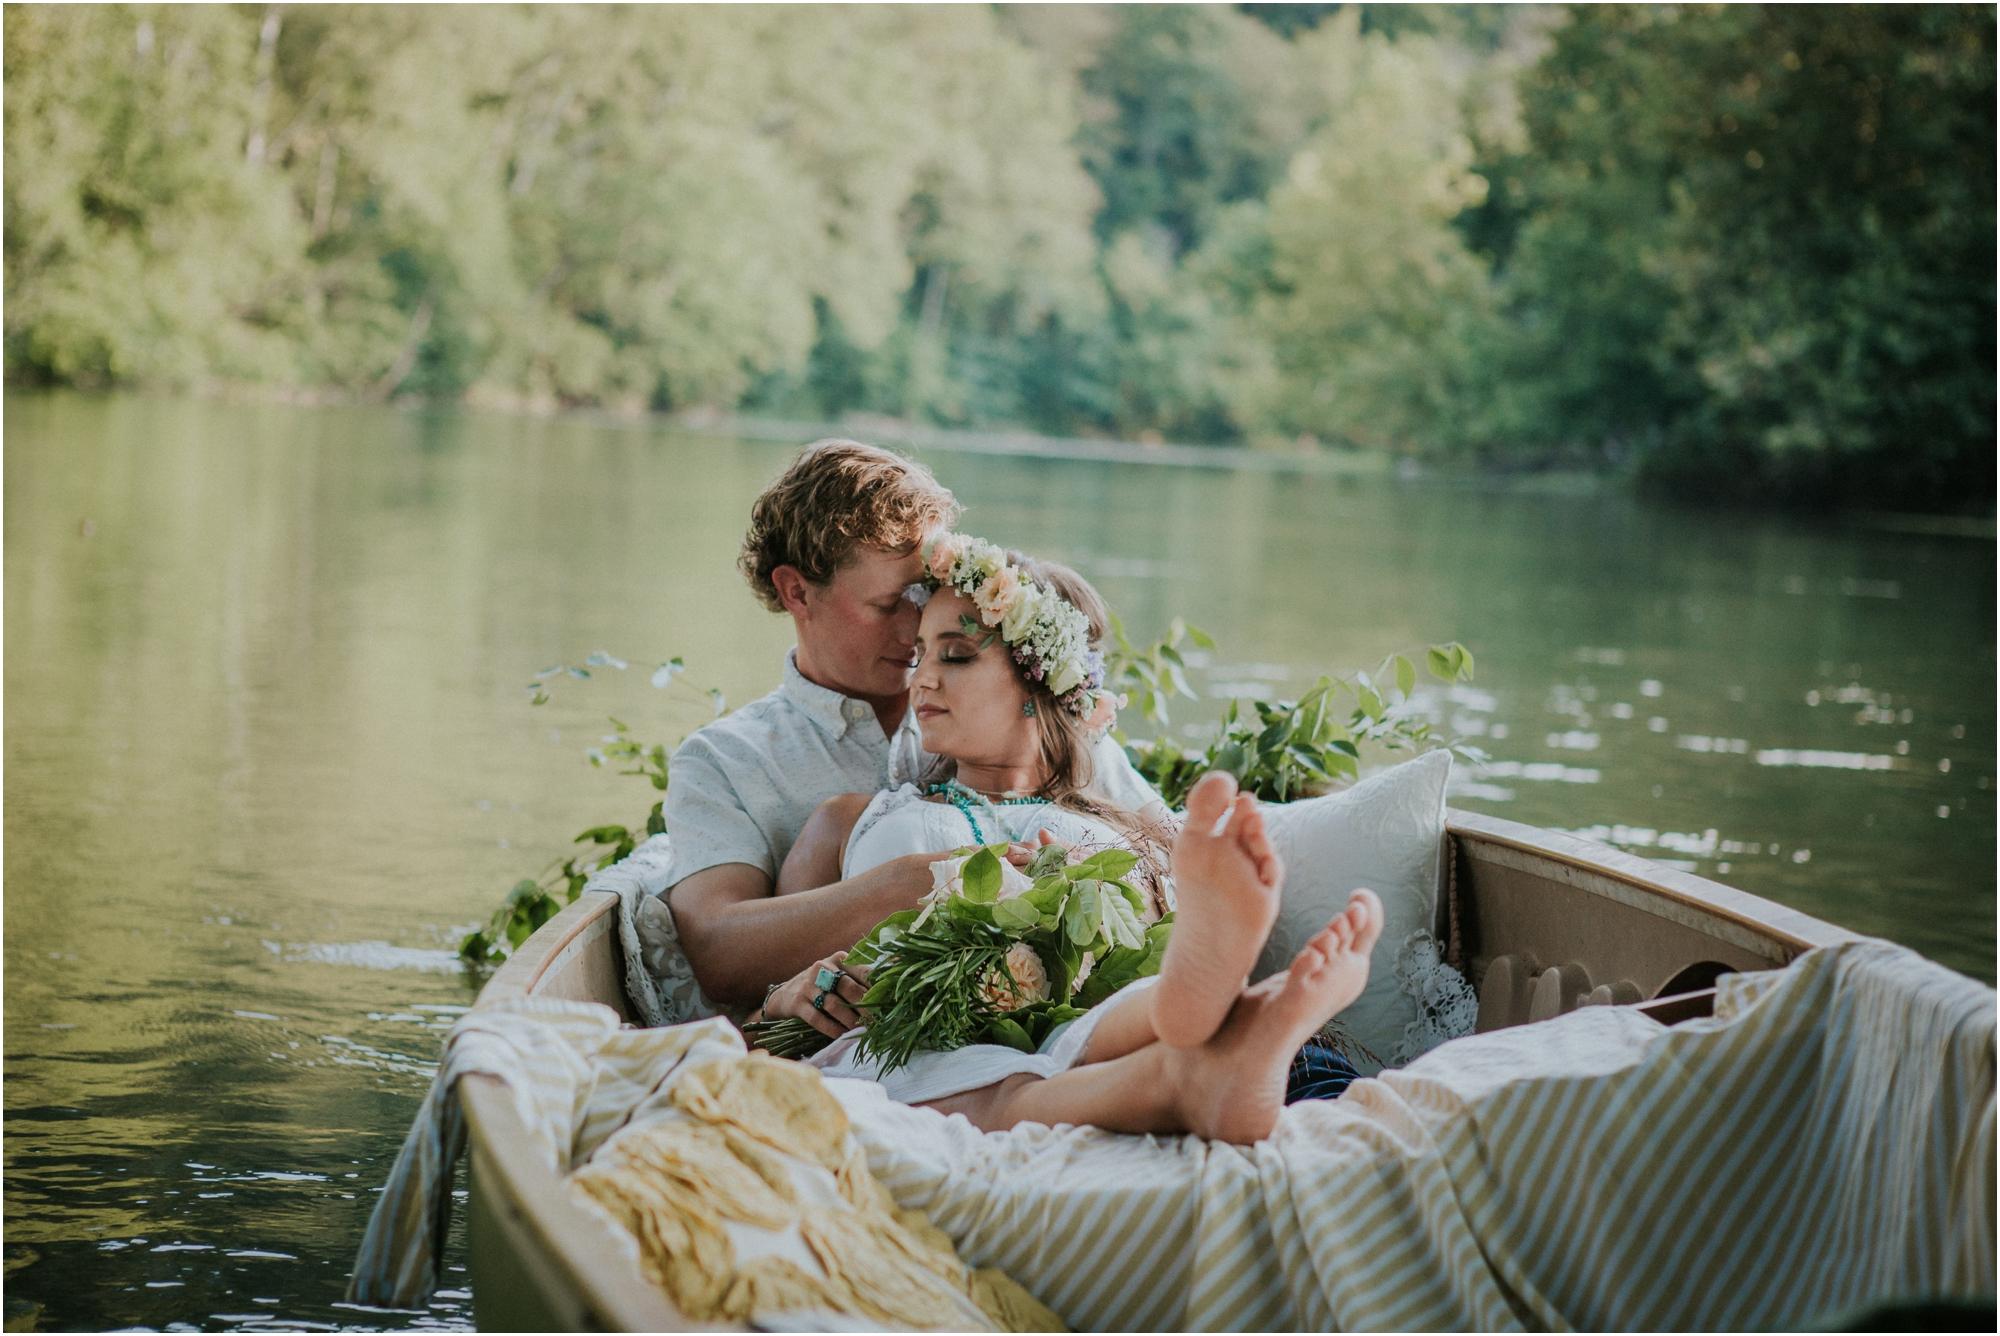 homestead-on-the-holston-hiltons-virginia-bohemian-canoe-styled-shoot-northeast-tennessee-elopement-wild-free-spirit_0014.jpg